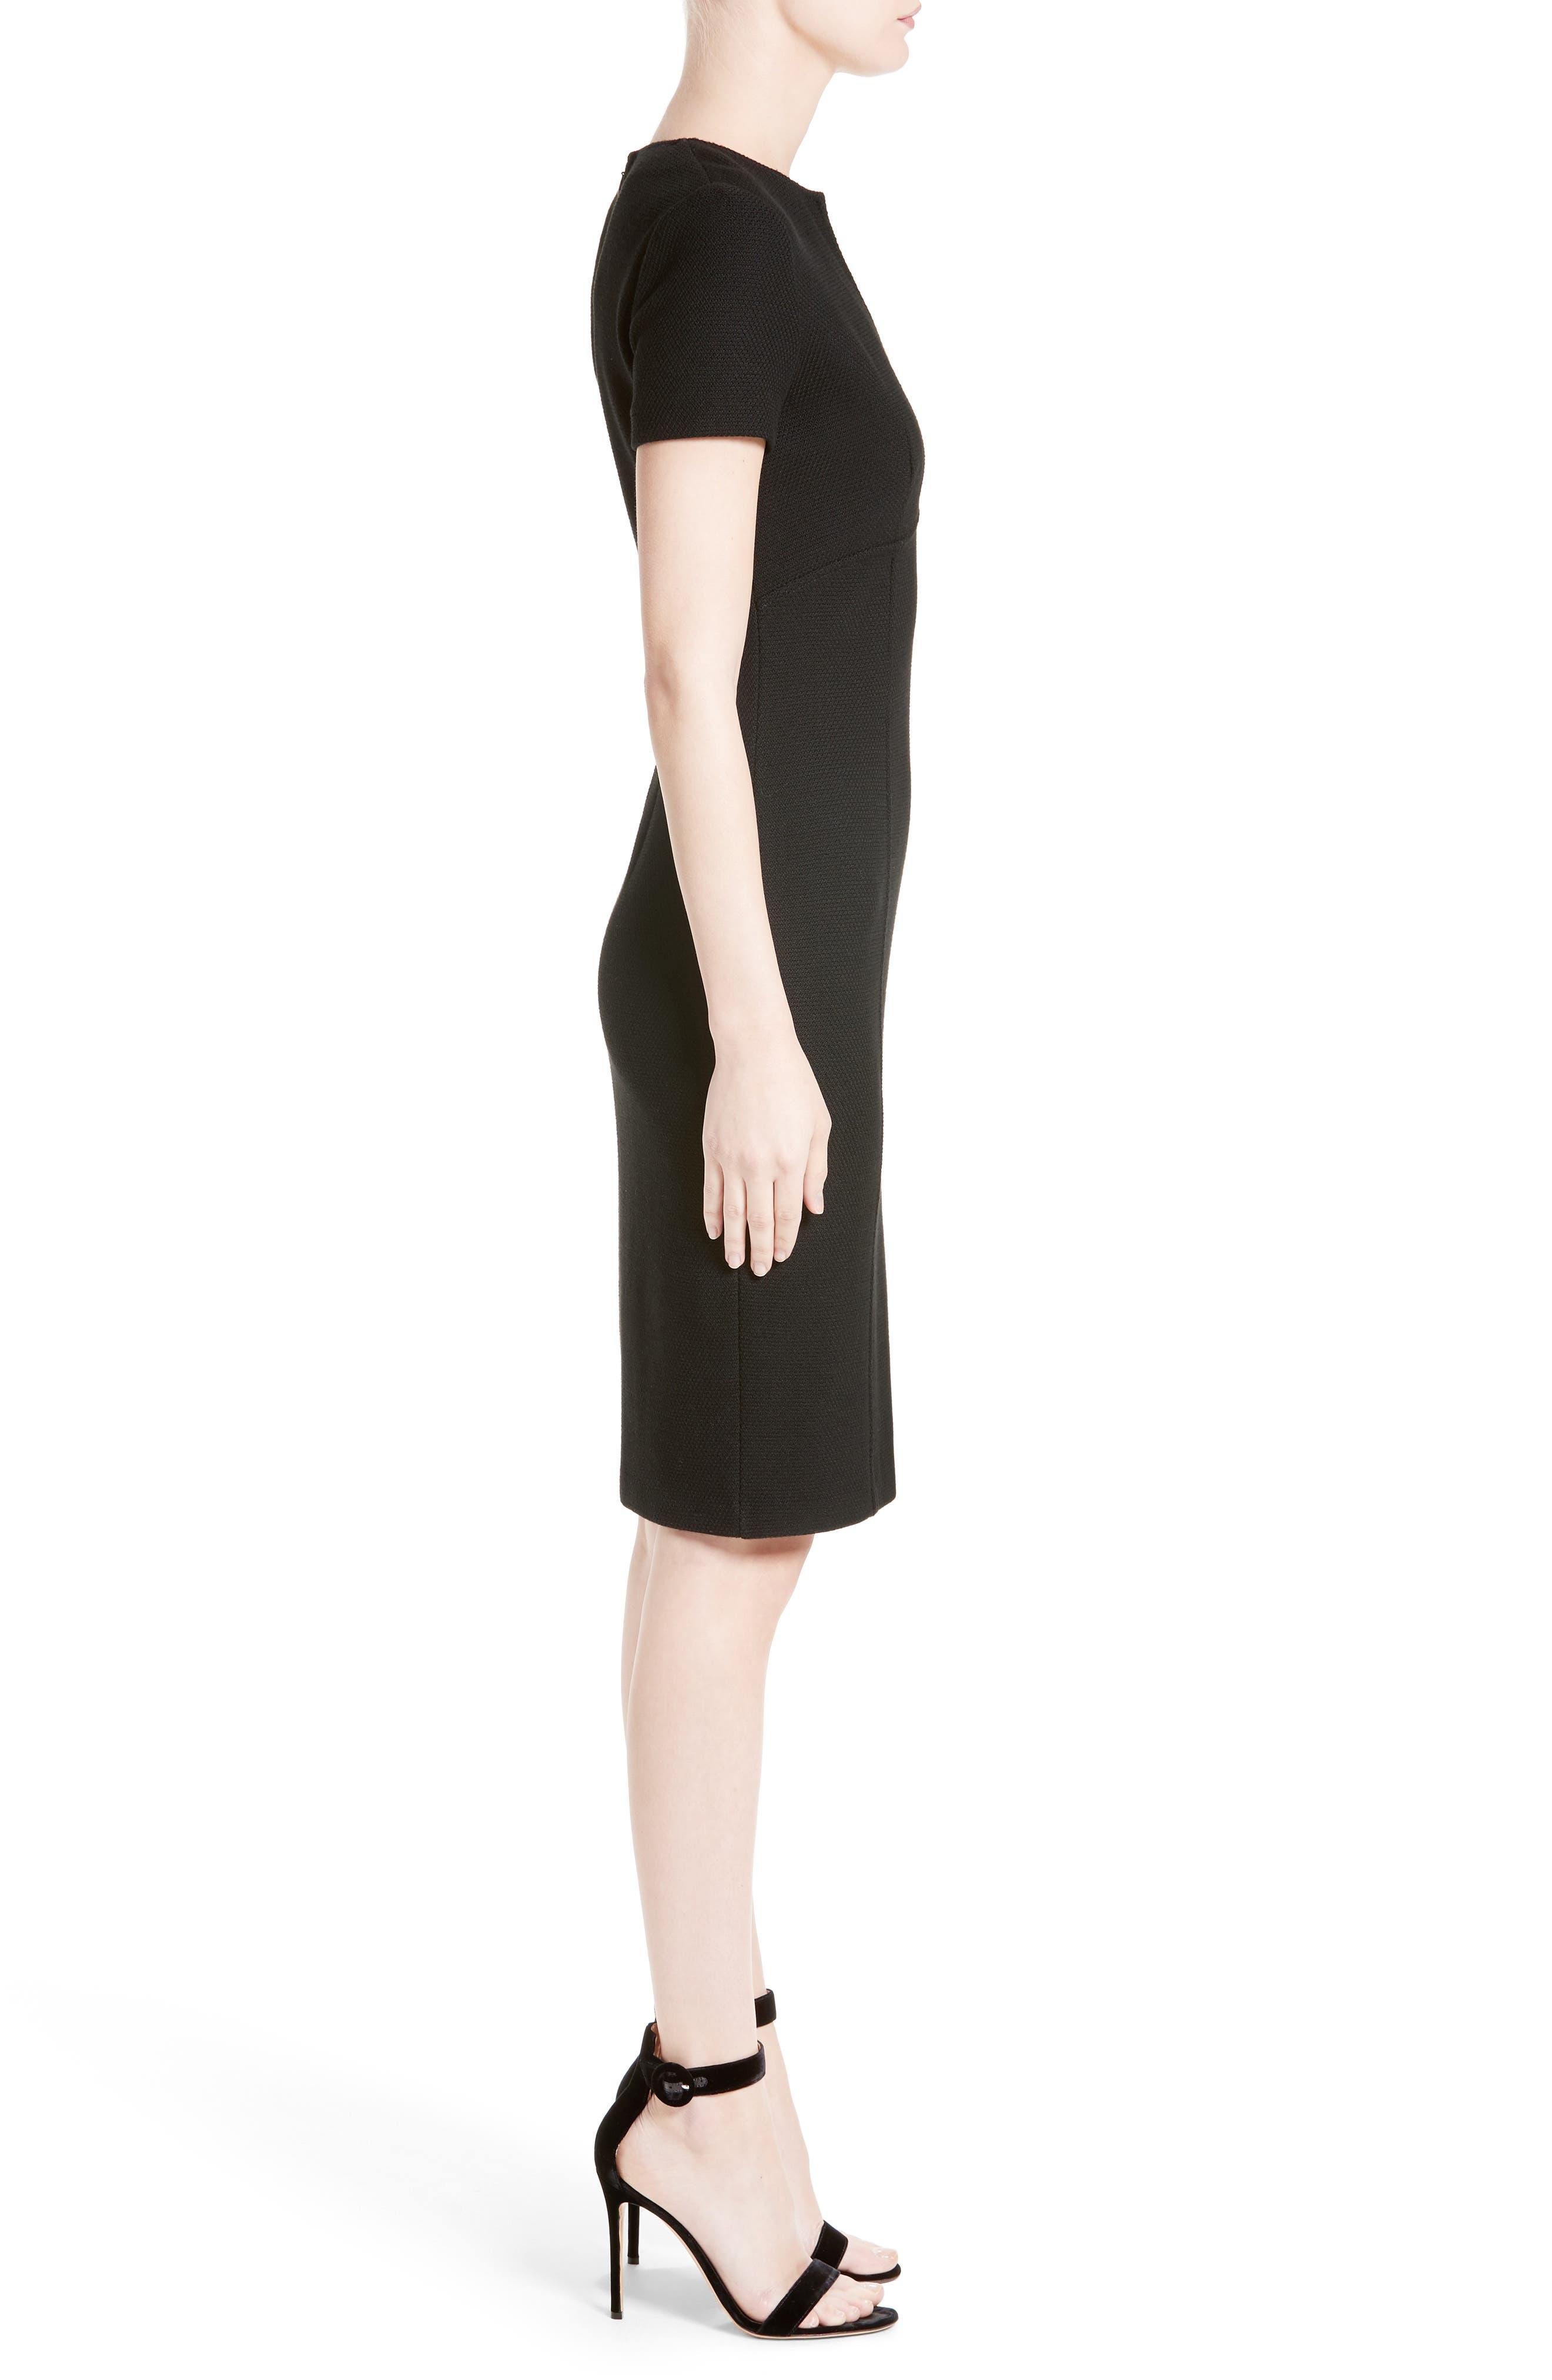 ST. JOHN COLLECTION, Micro Bouclé Knit Dress, Alternate thumbnail 3, color, CAVIAR